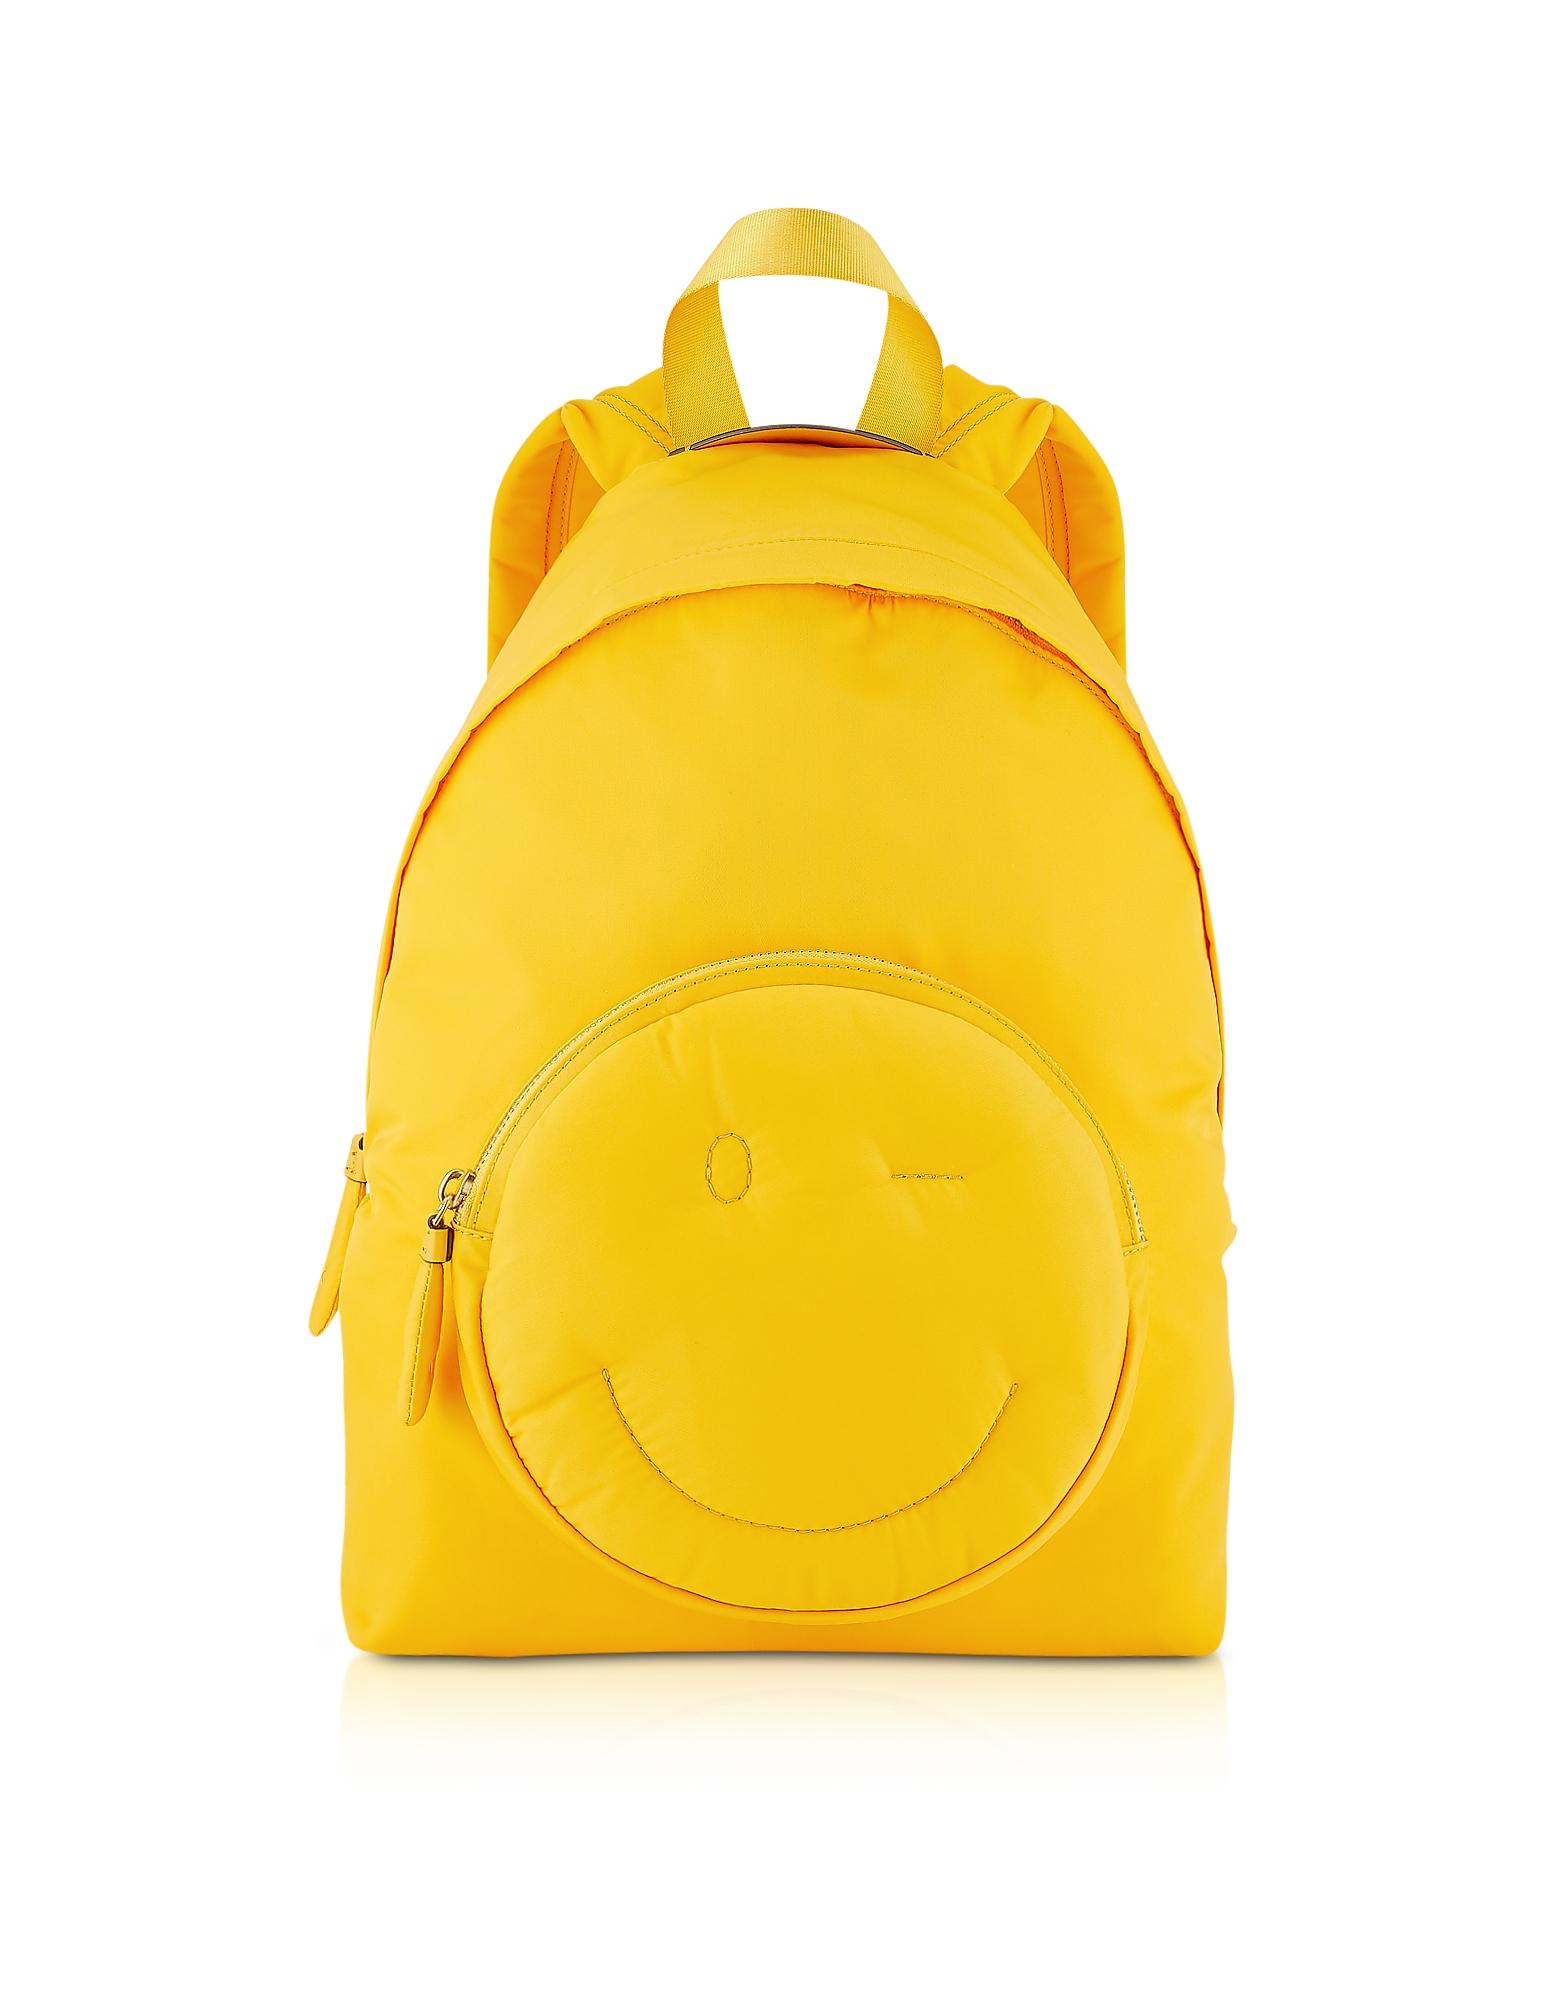 Solei Nylon Chubby Wink Backpack